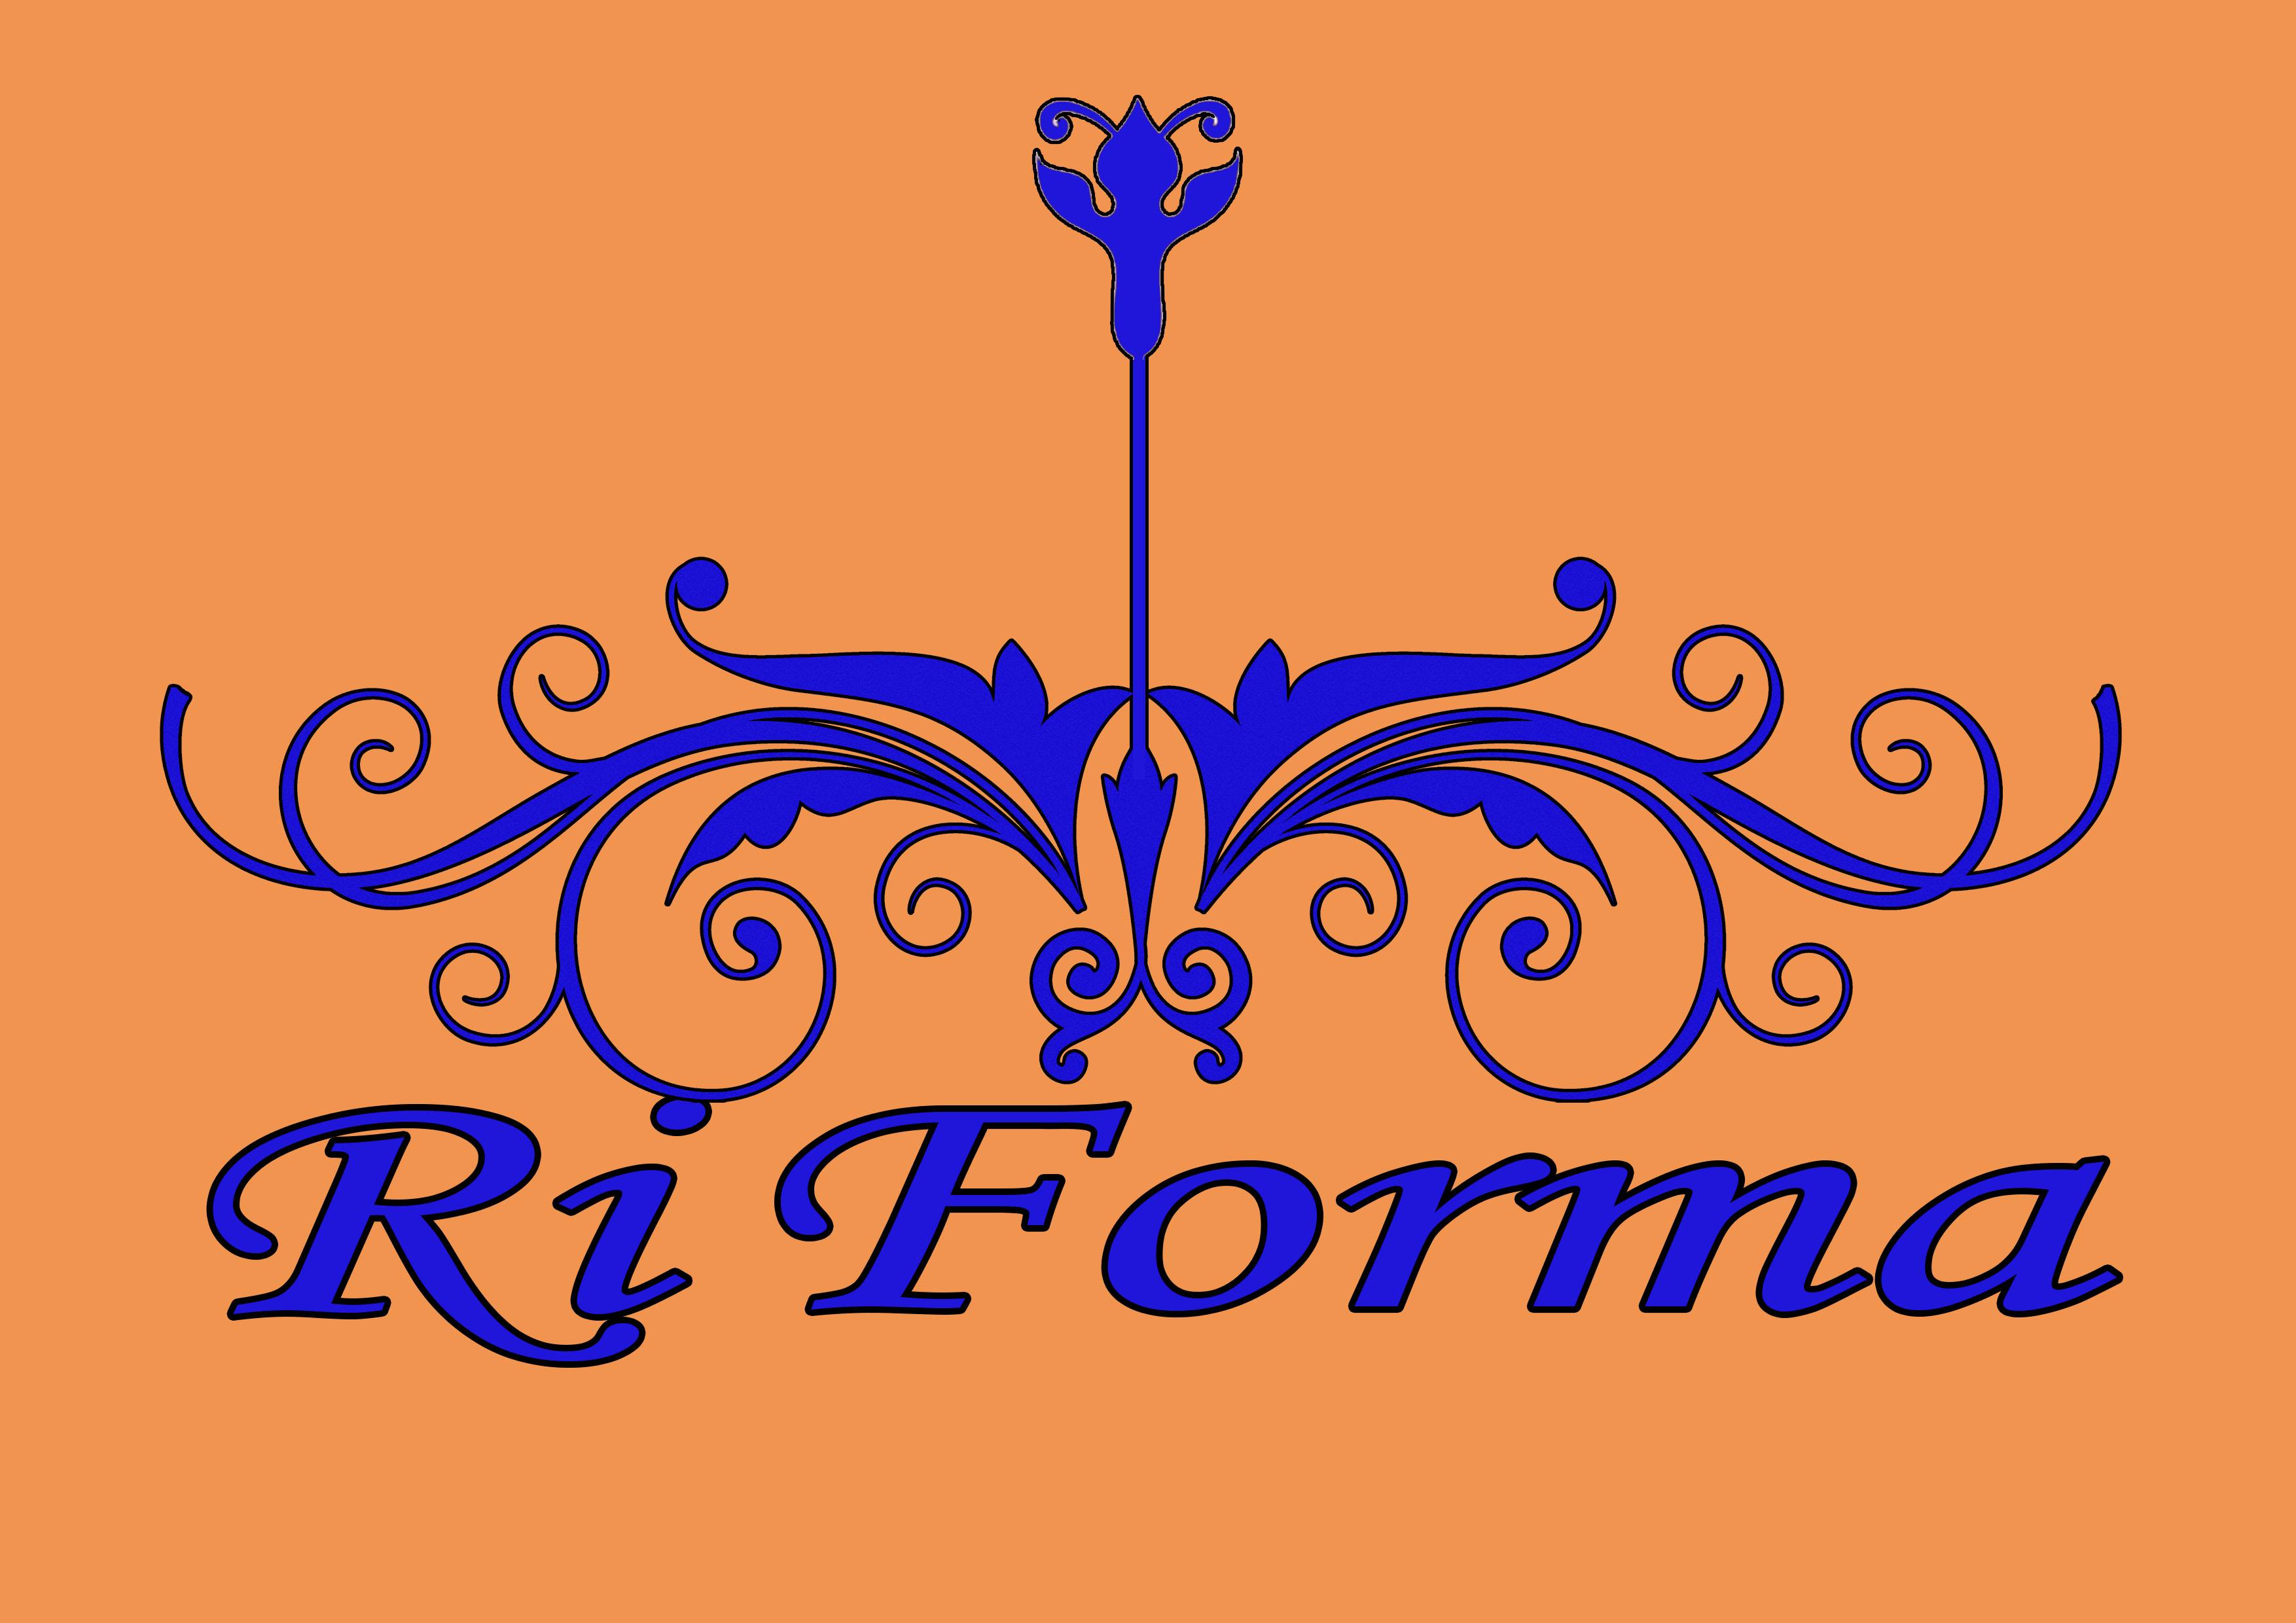 Разработка логотипа и элементов фирменного стиля фото f_793579ce541892a6.jpg